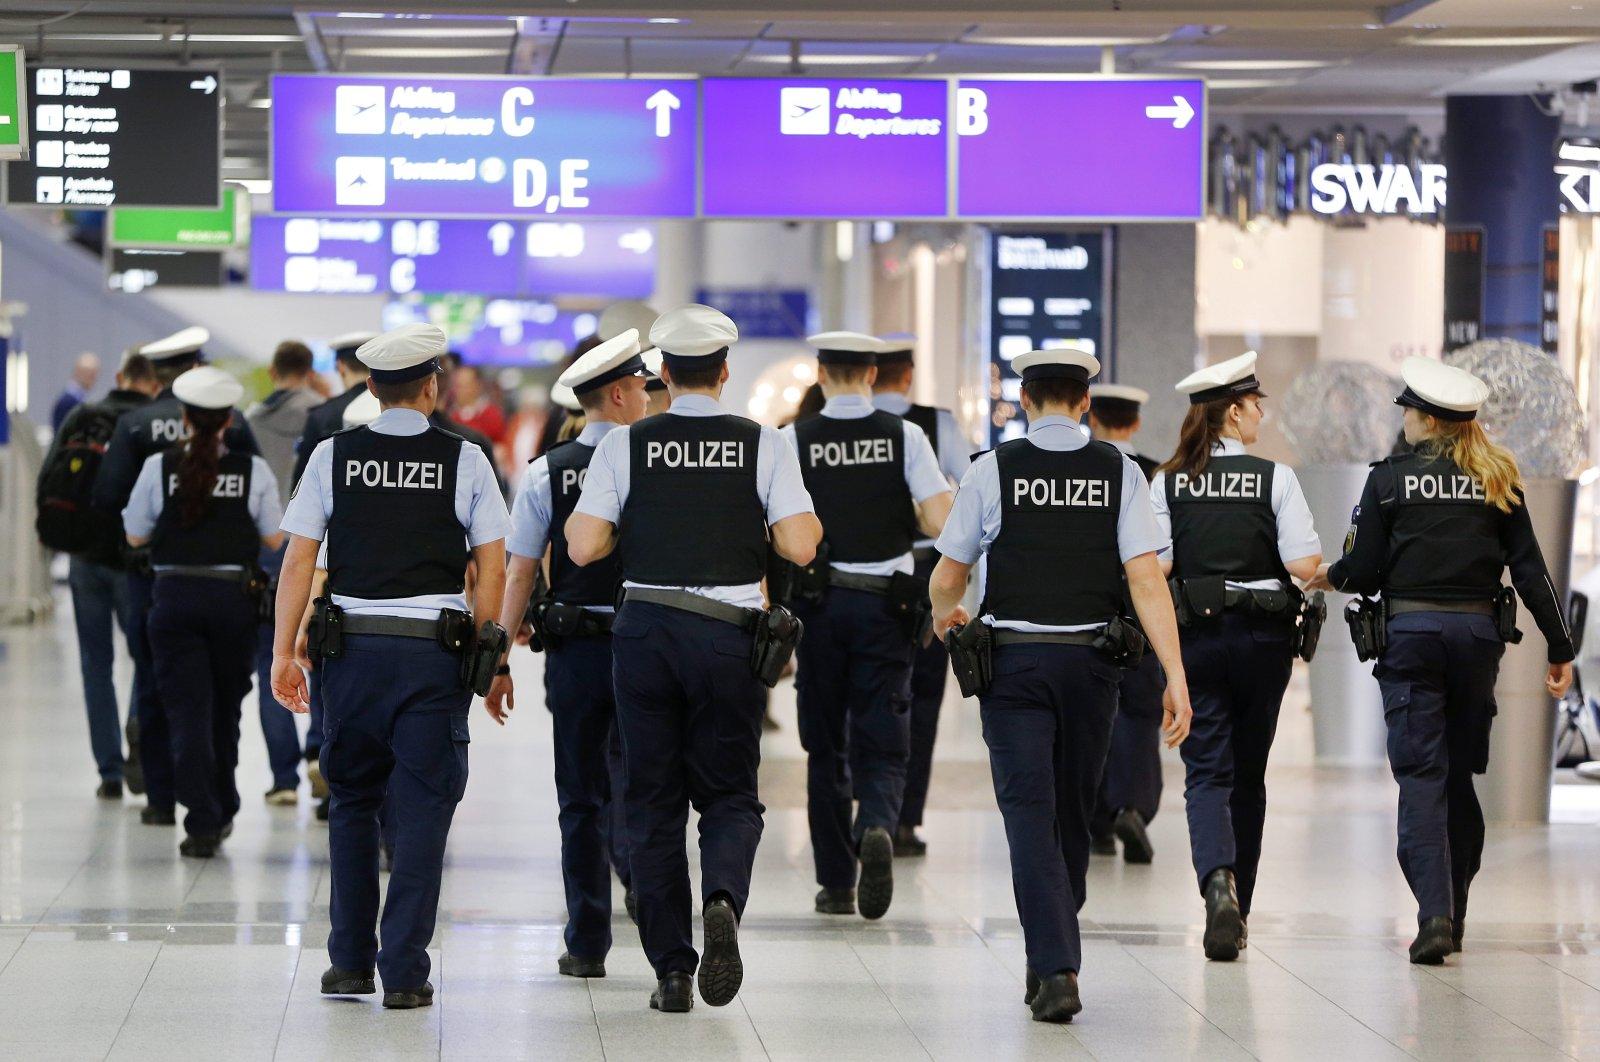 German police officers walk in an airport terminal, Frankfurt, March 23, 2016. (AP Photo)